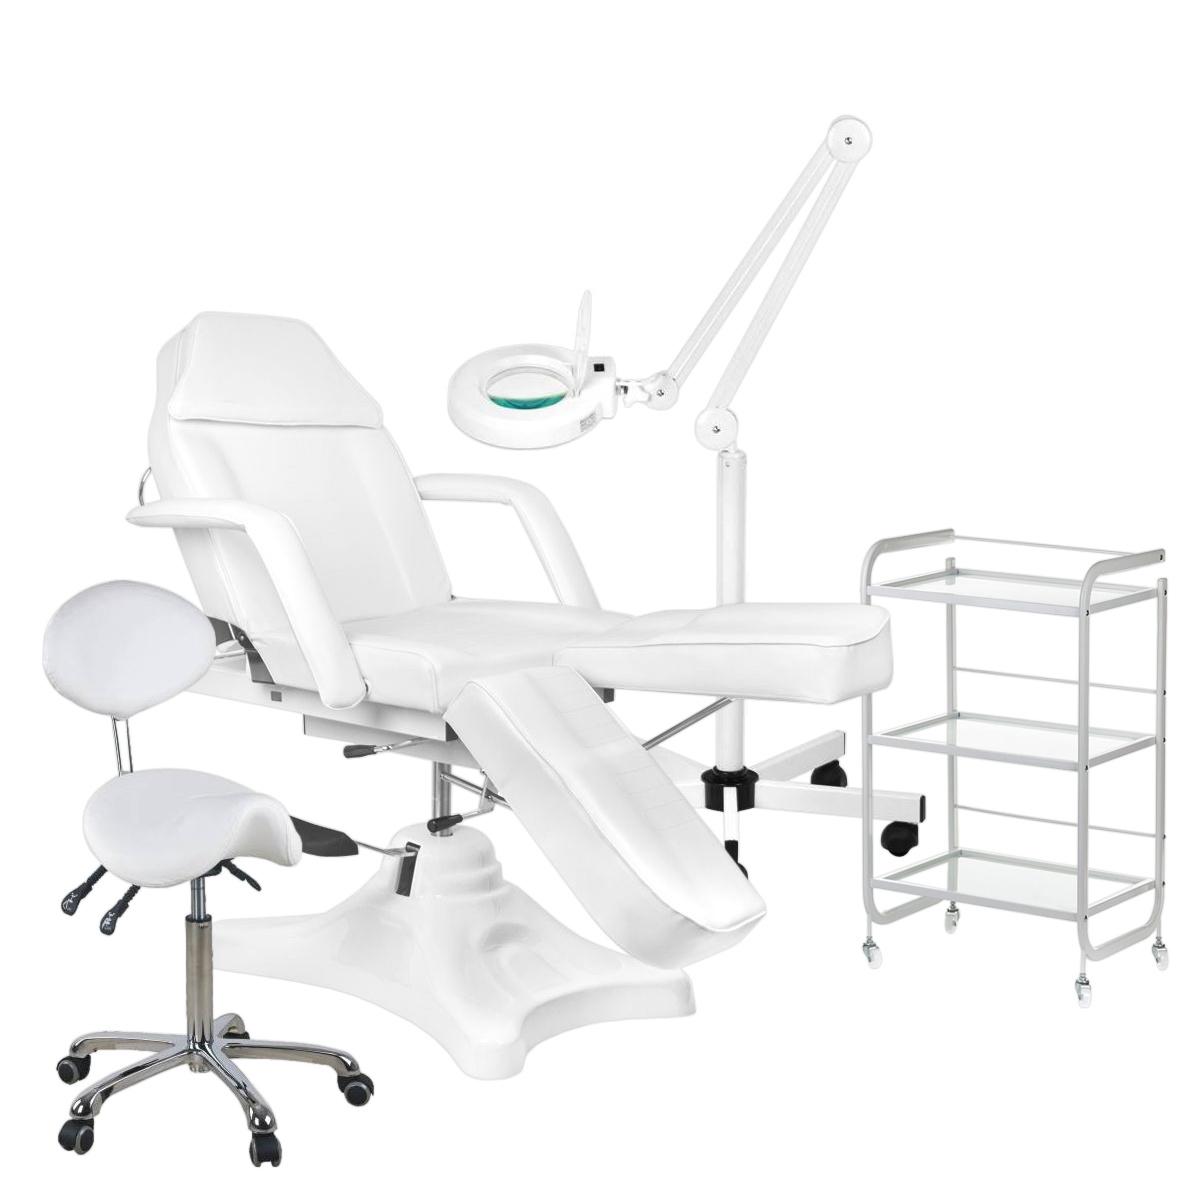 Behandel/pedicure starter set WIT